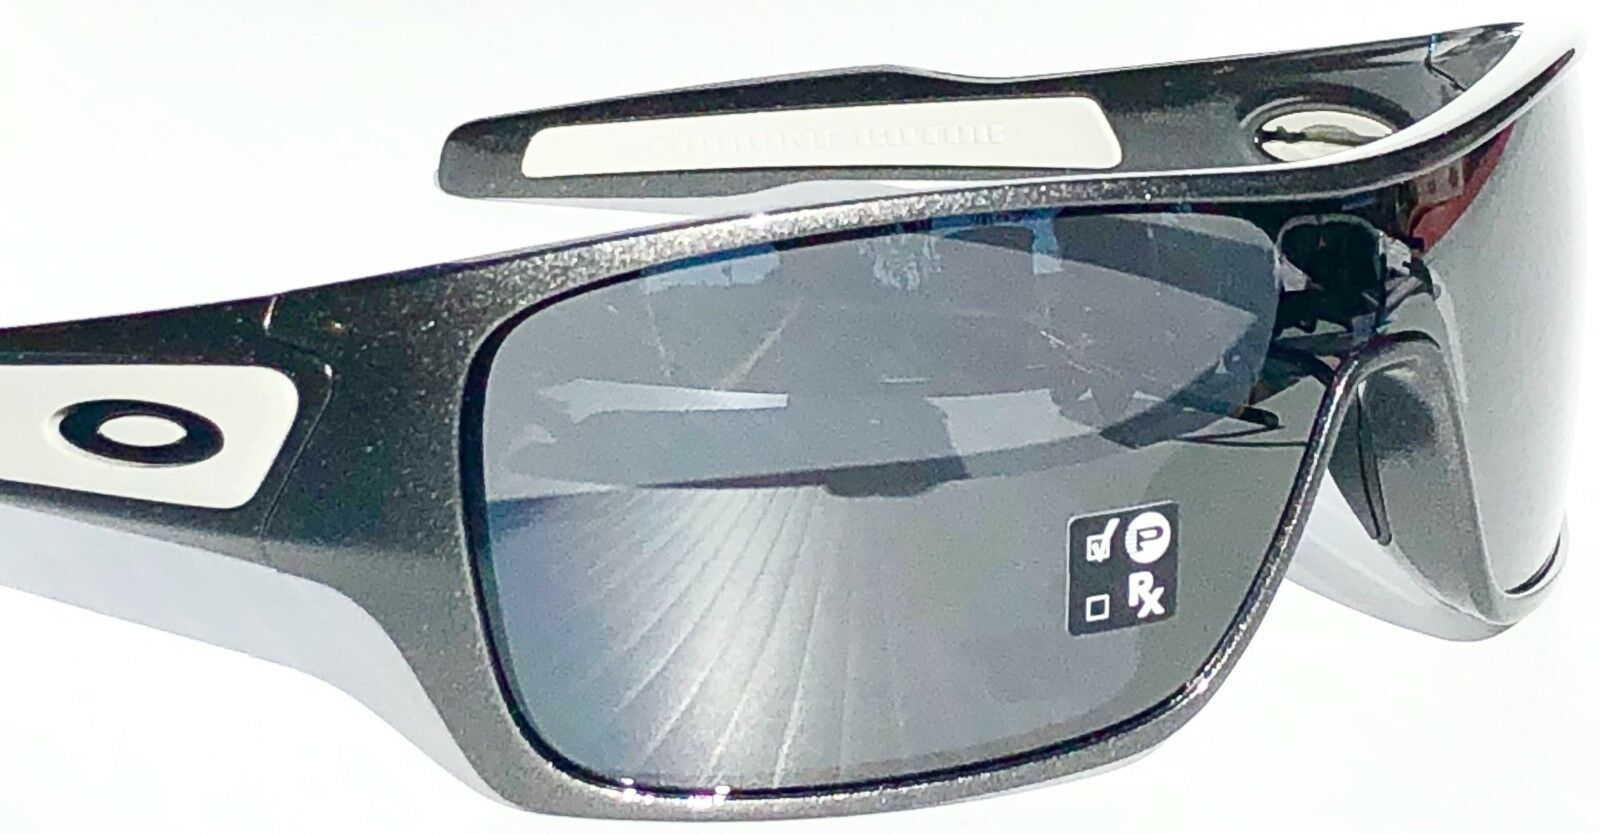 d0888cc5709 Oakley Men Turbine Rotor Polarized Sunglasses Oo9307 05 for sale ...